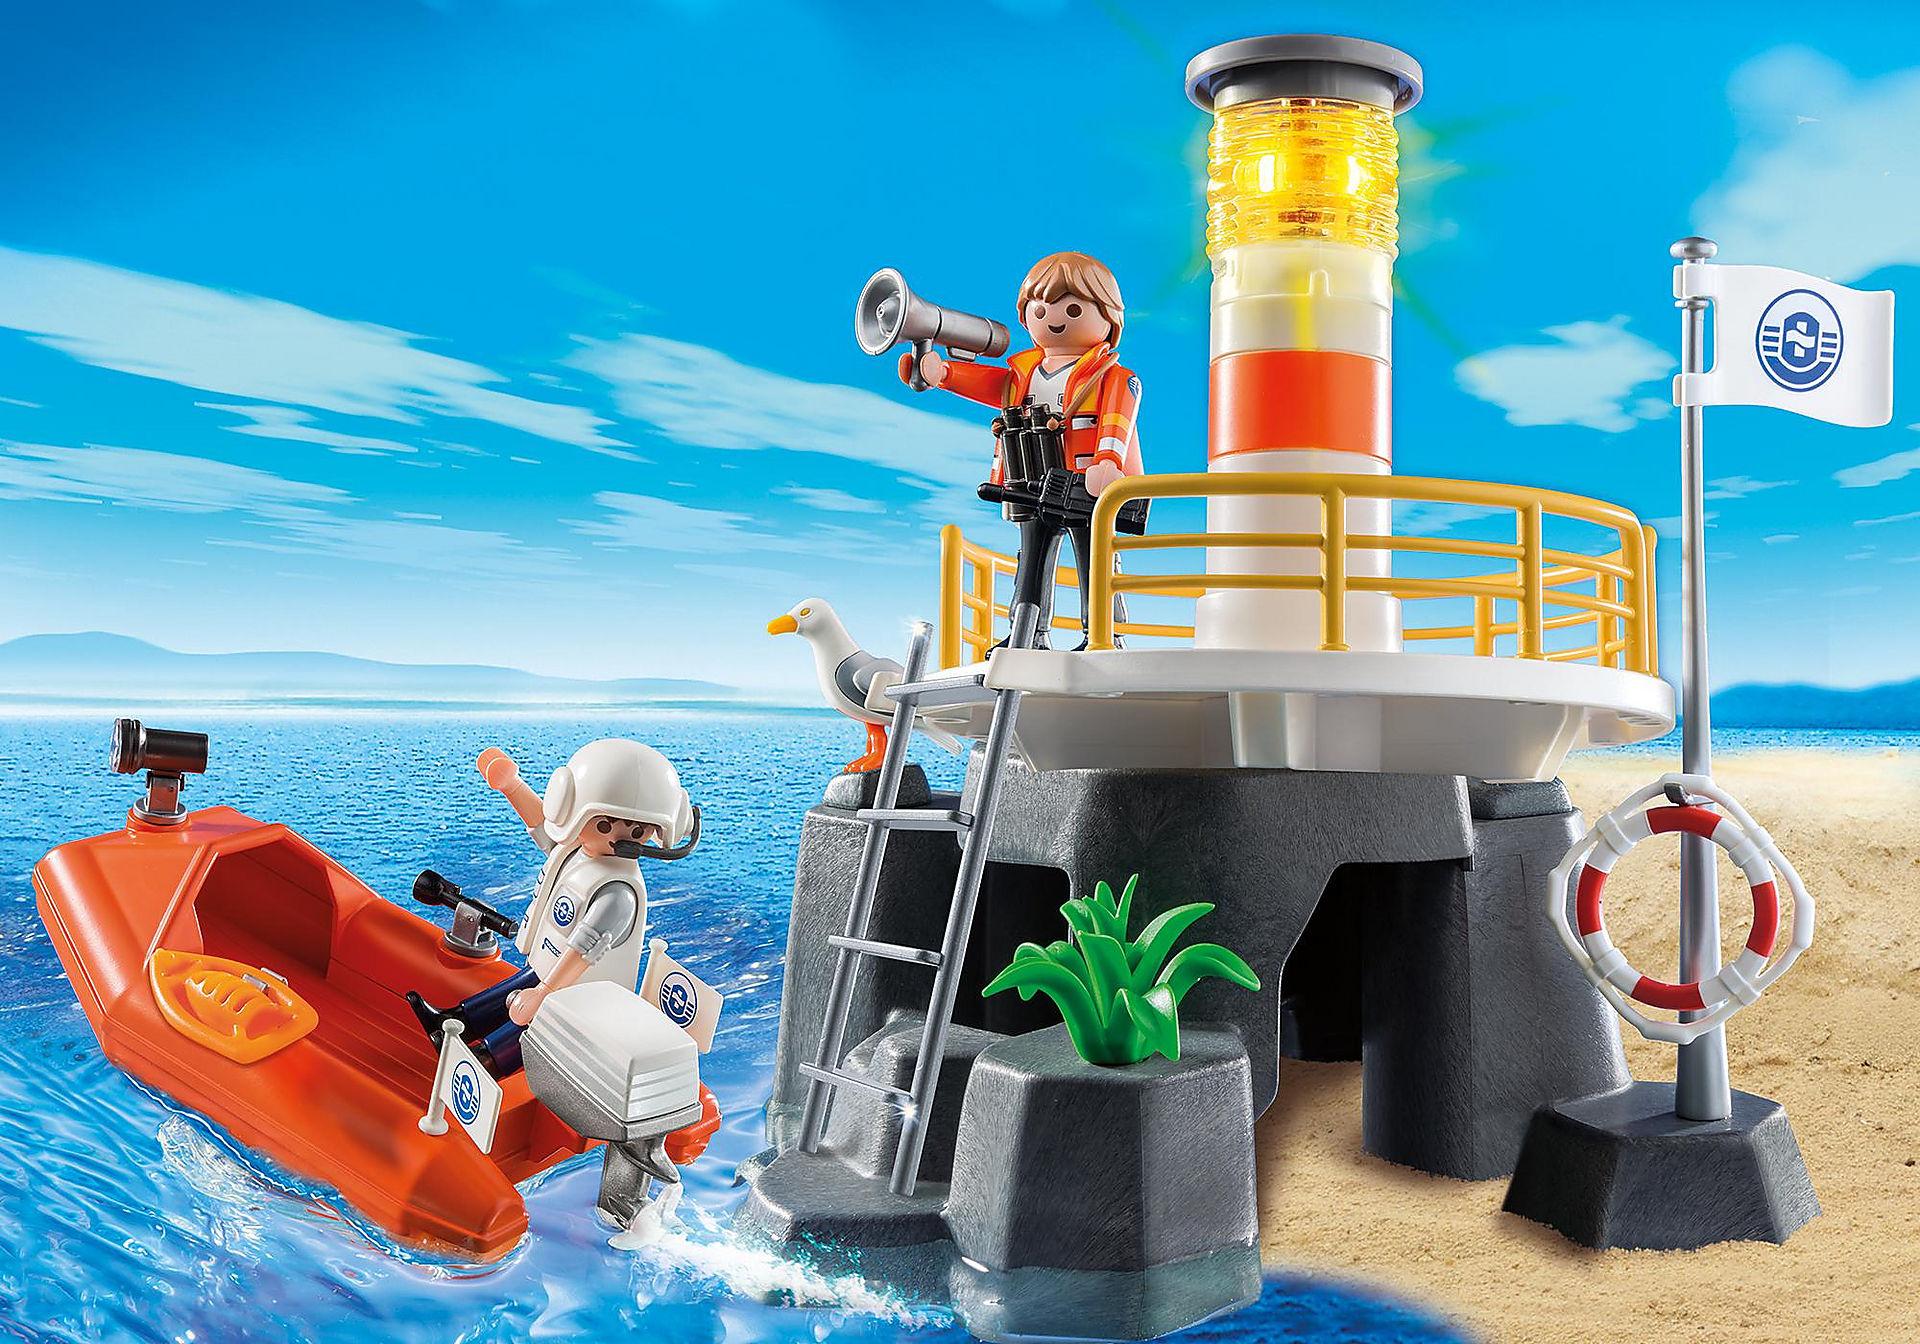 Playmobil Leuchtturm Set für 14,54€ + Versand